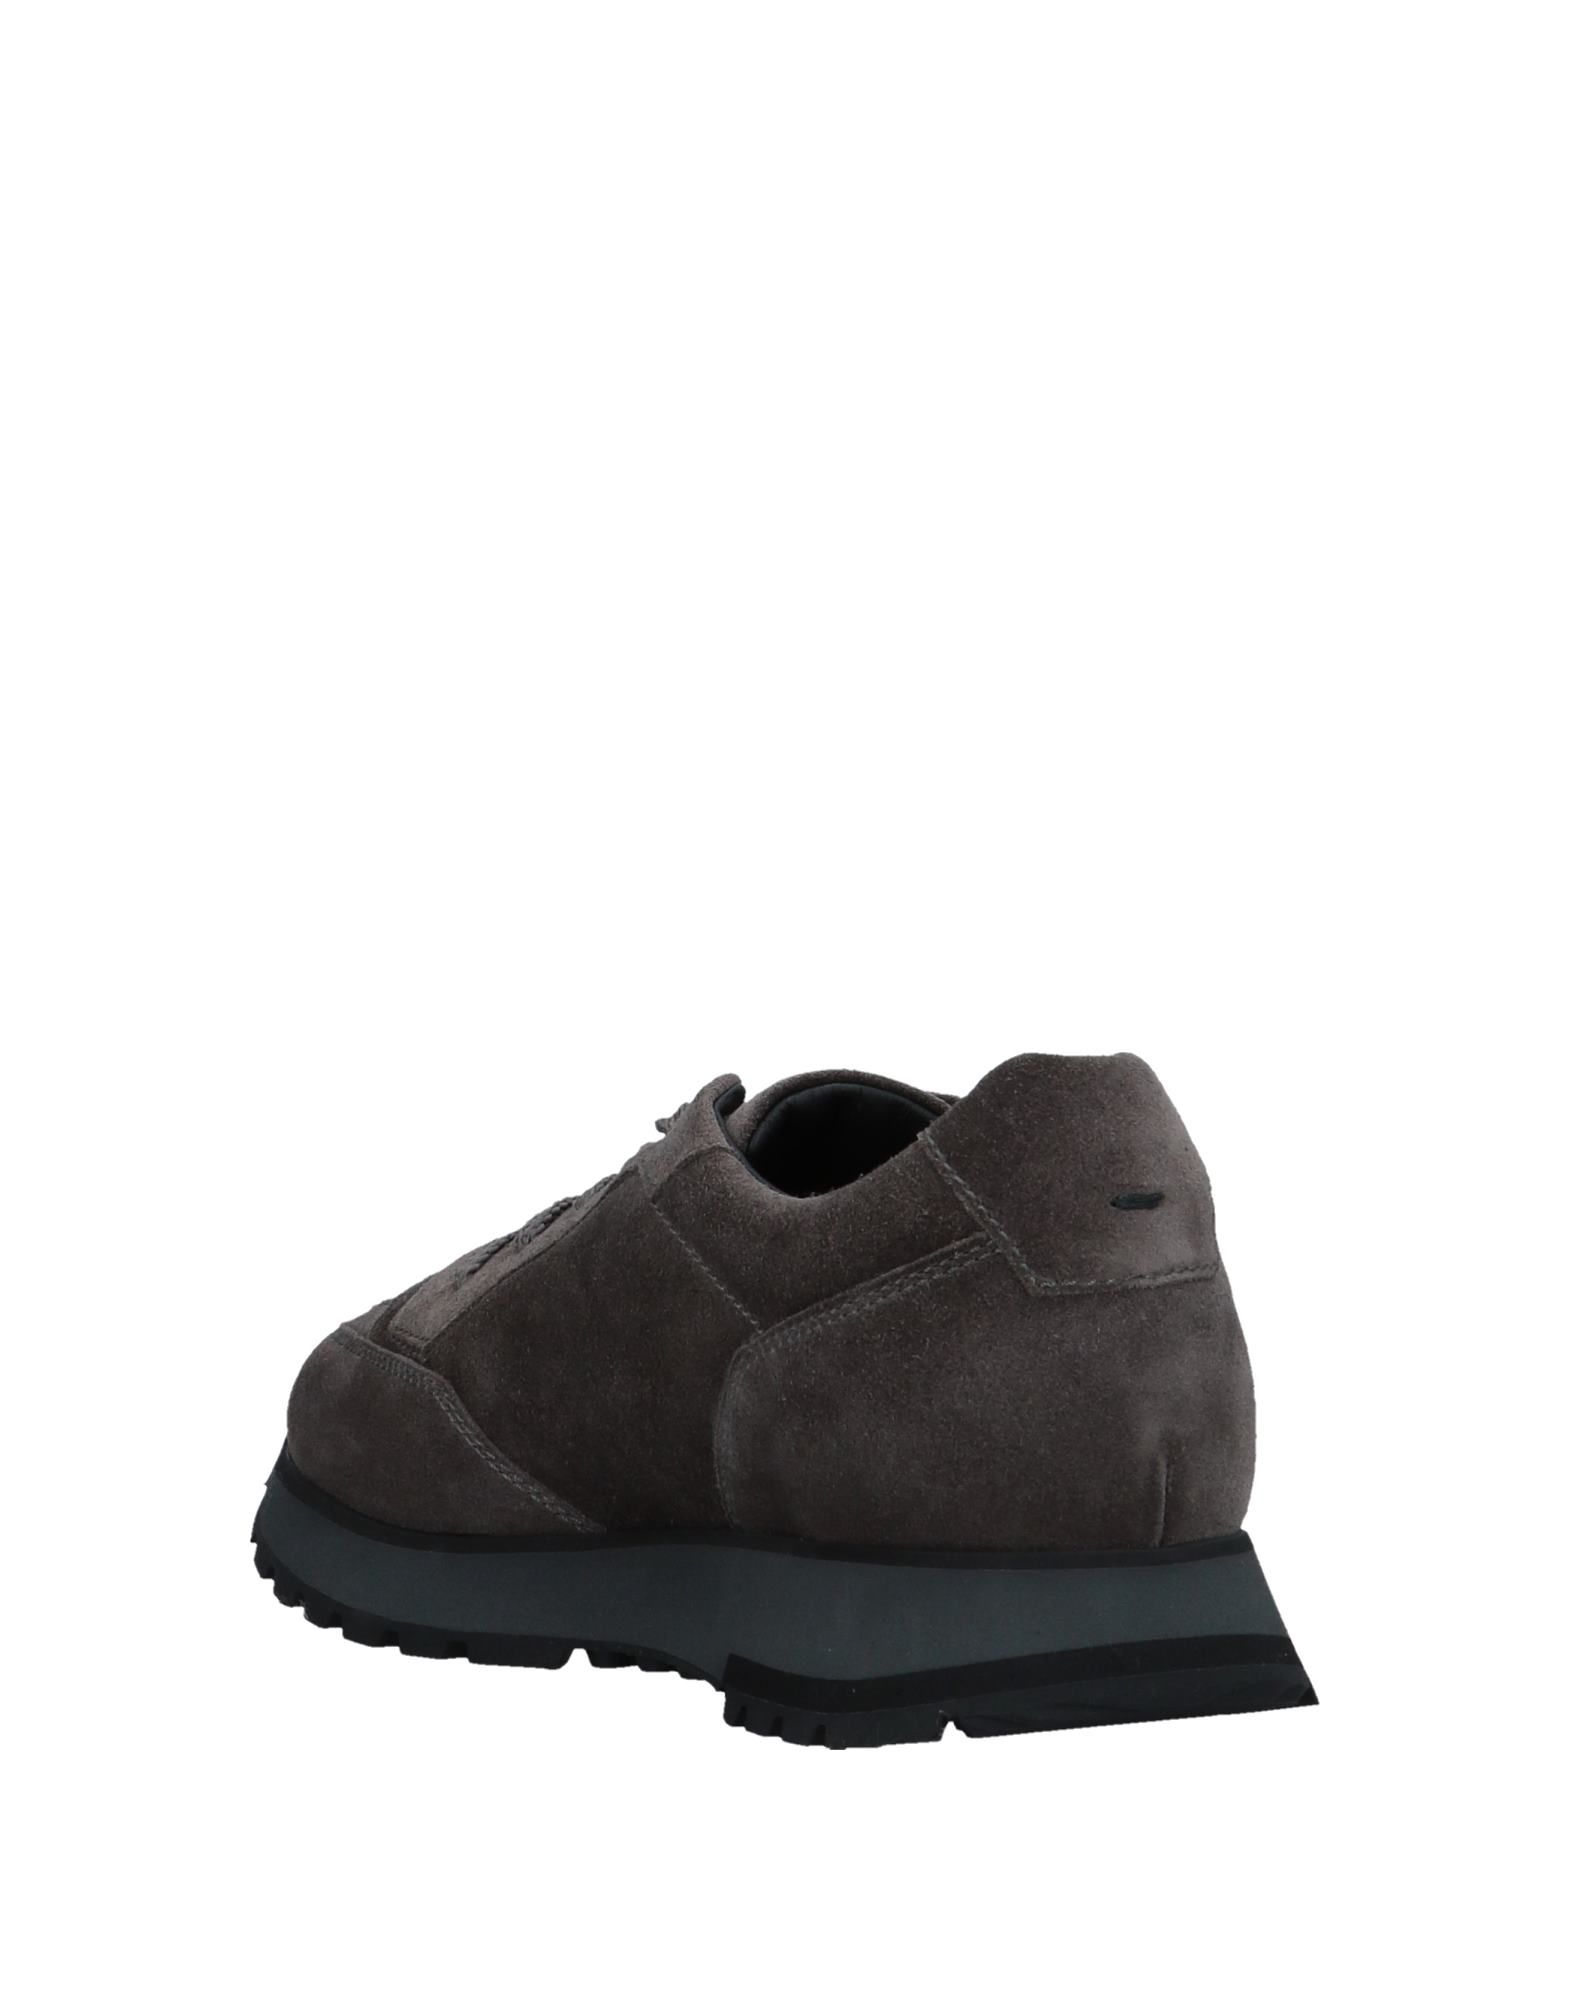 Santoni 11541251BO Sneakers Herren  11541251BO Santoni 8a0237